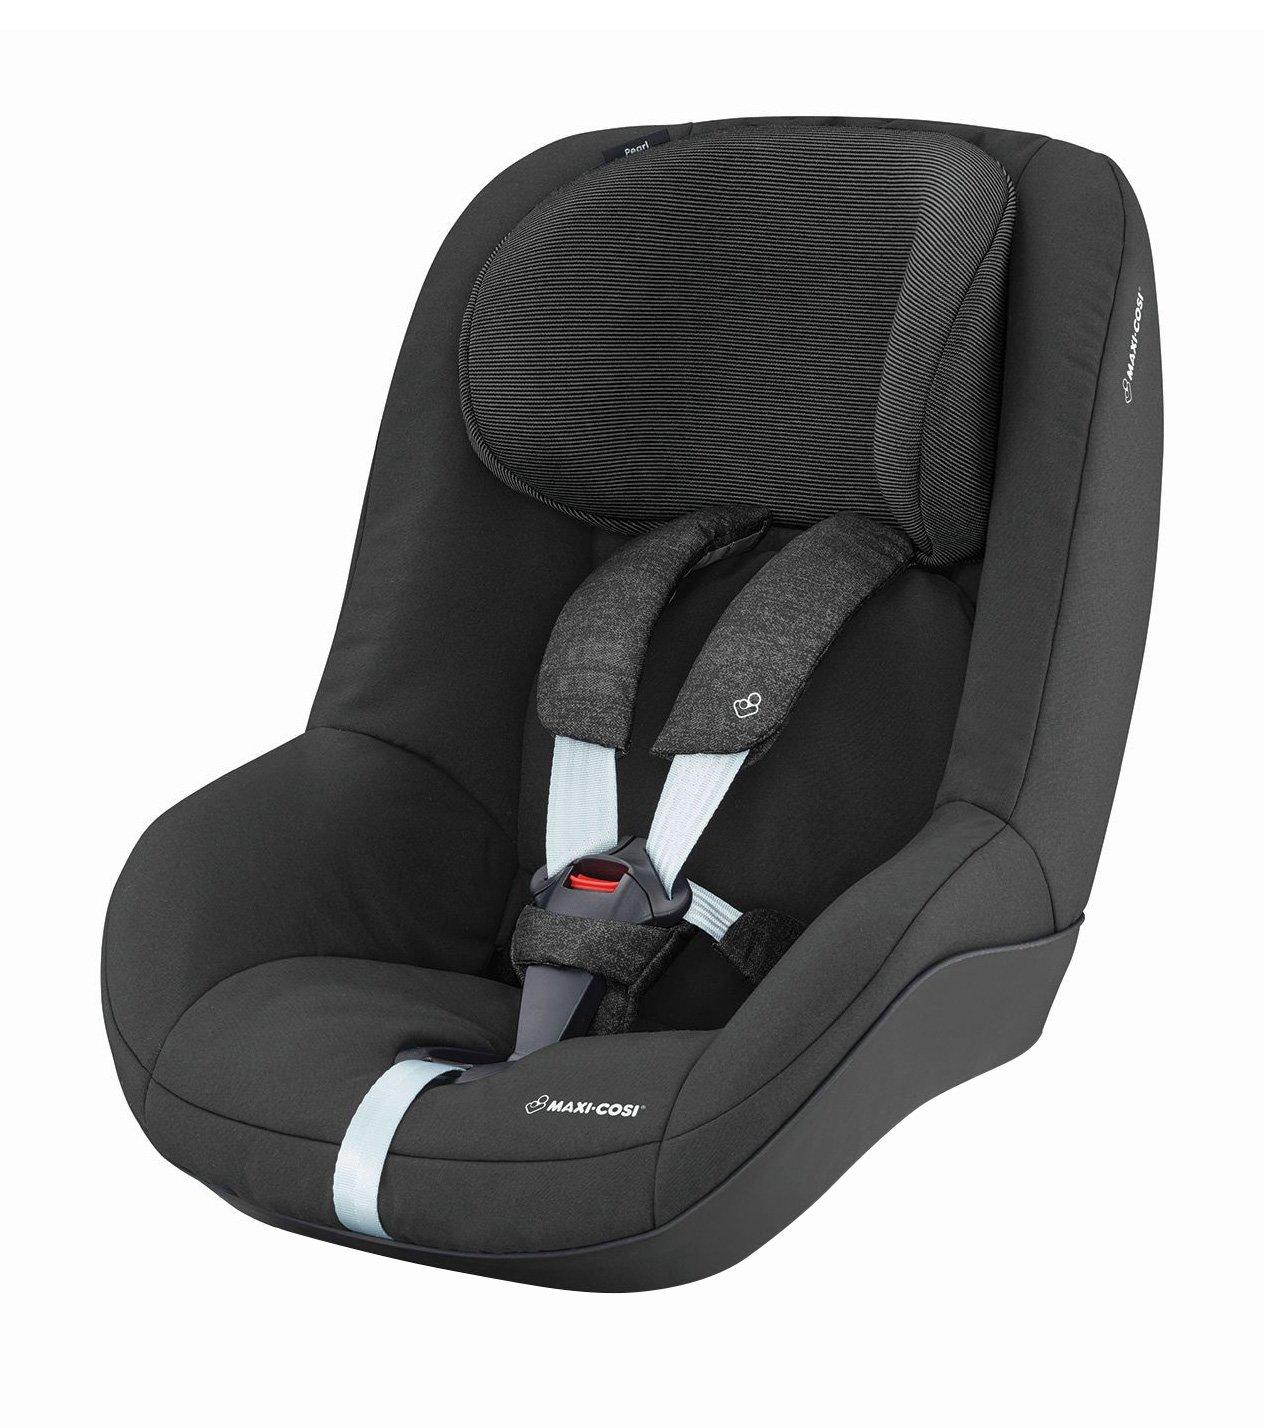 Bērnu autosēdeklis 9-18 kg MAXI-COSI Pearl Nomad Black